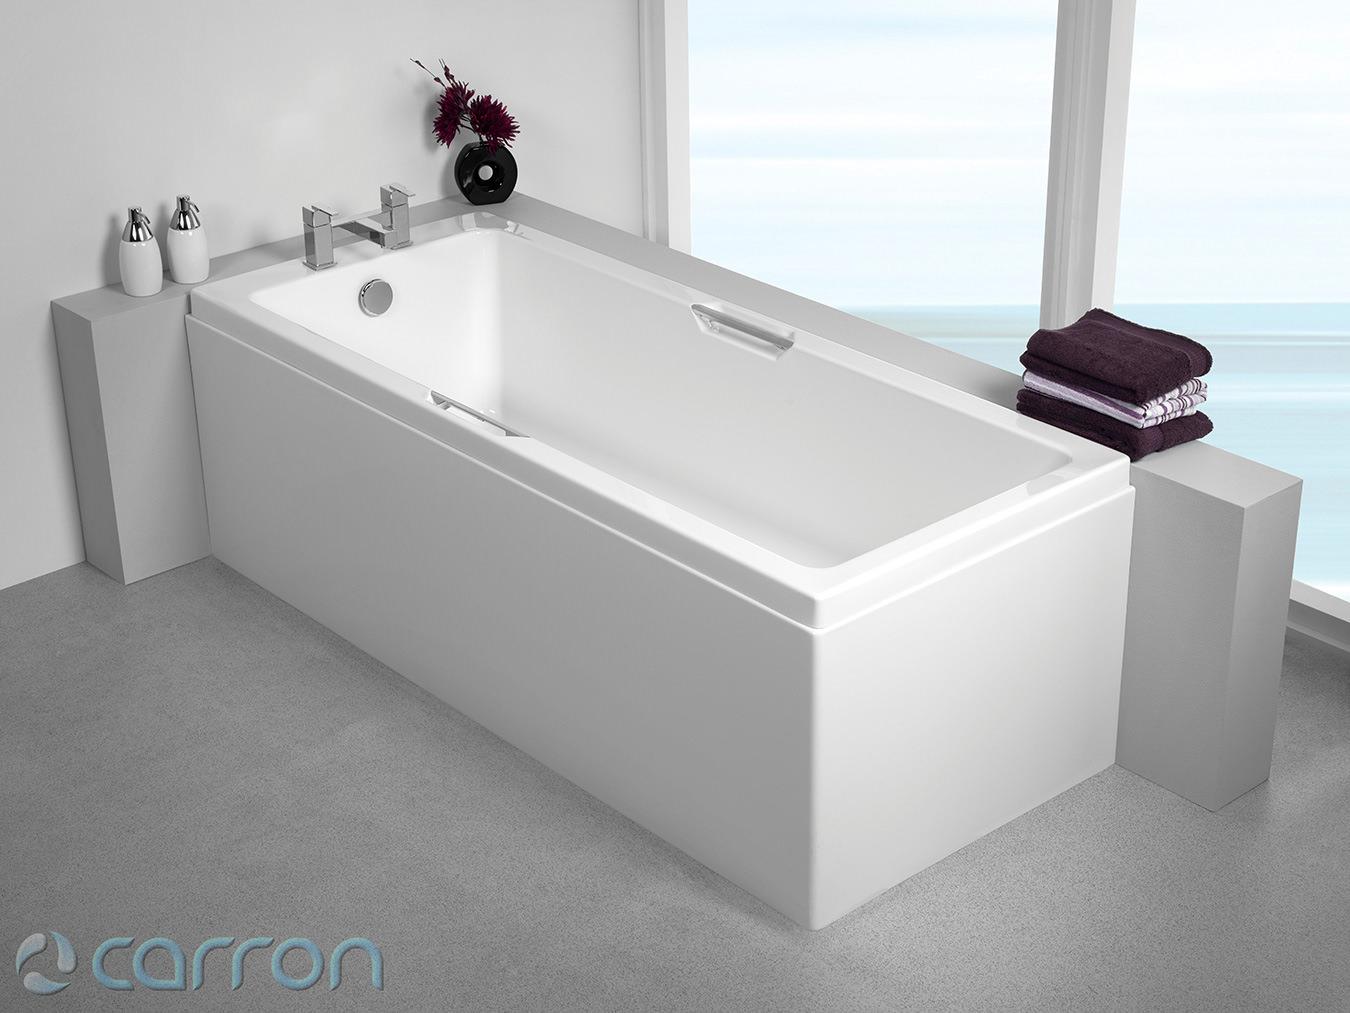 Carron Quantum Integra Single Ended Acrylic Bath 1700 X